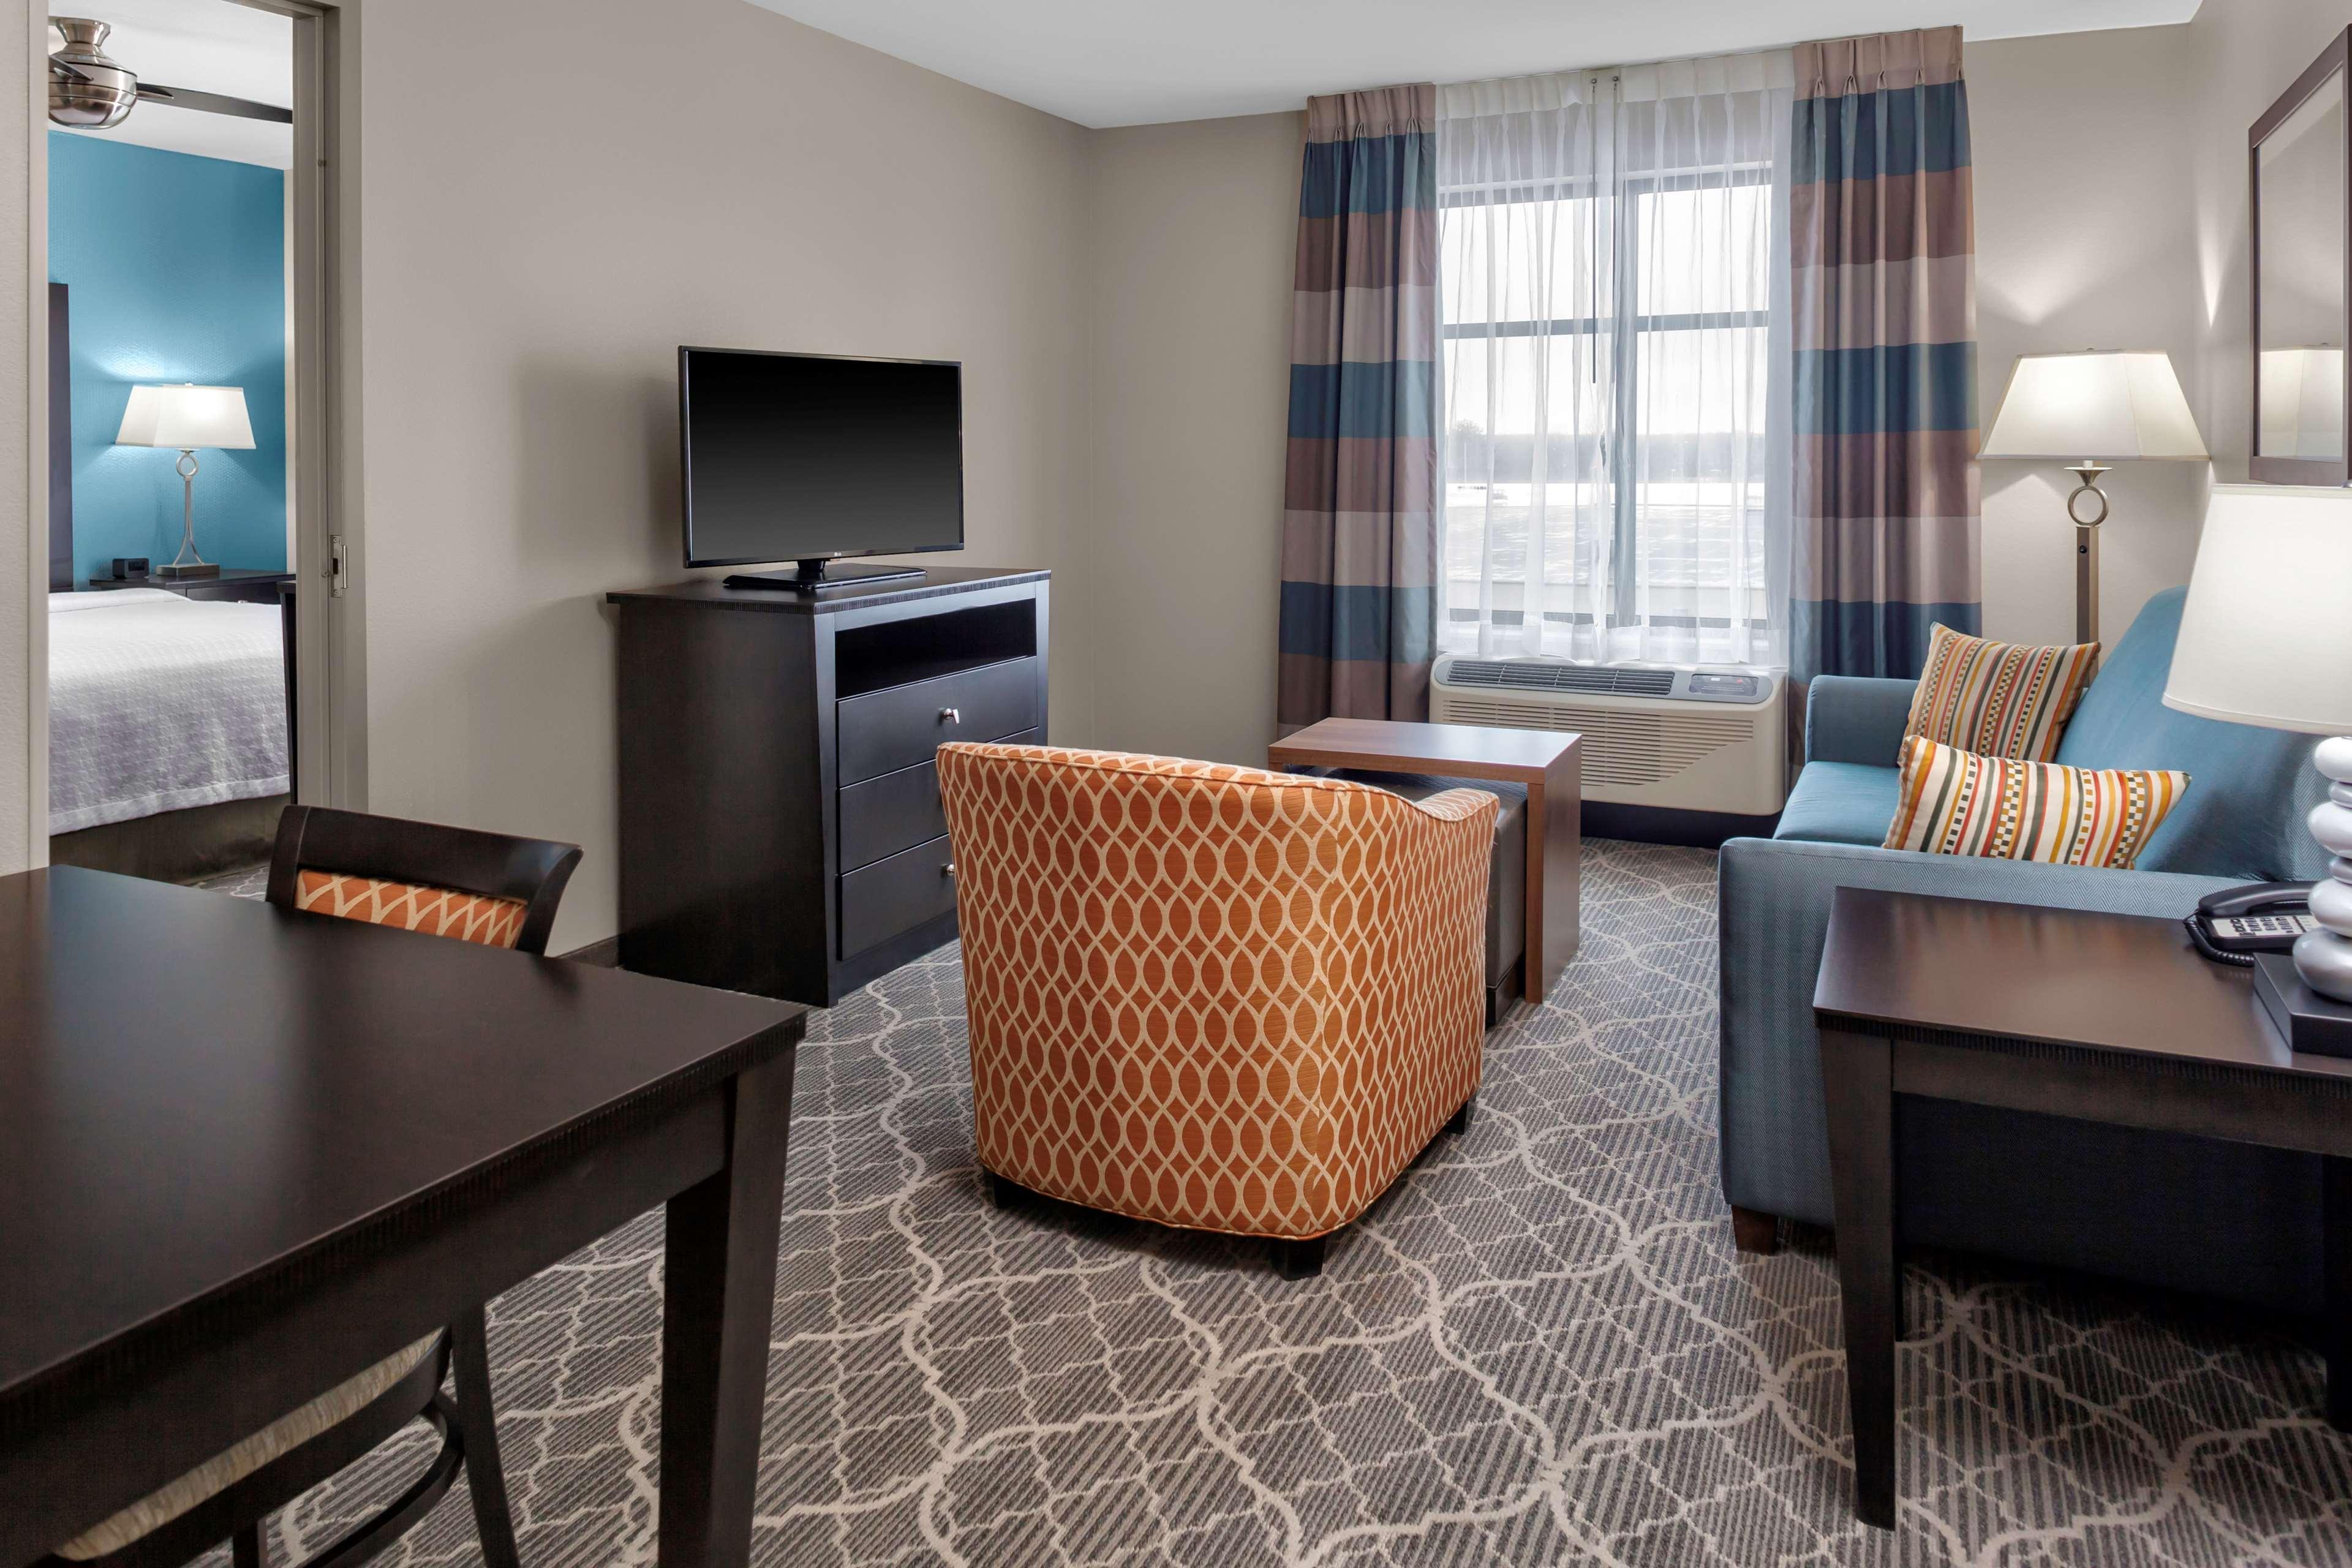 Homewood Suites by Hilton Wauwatosa Milwaukee image 20